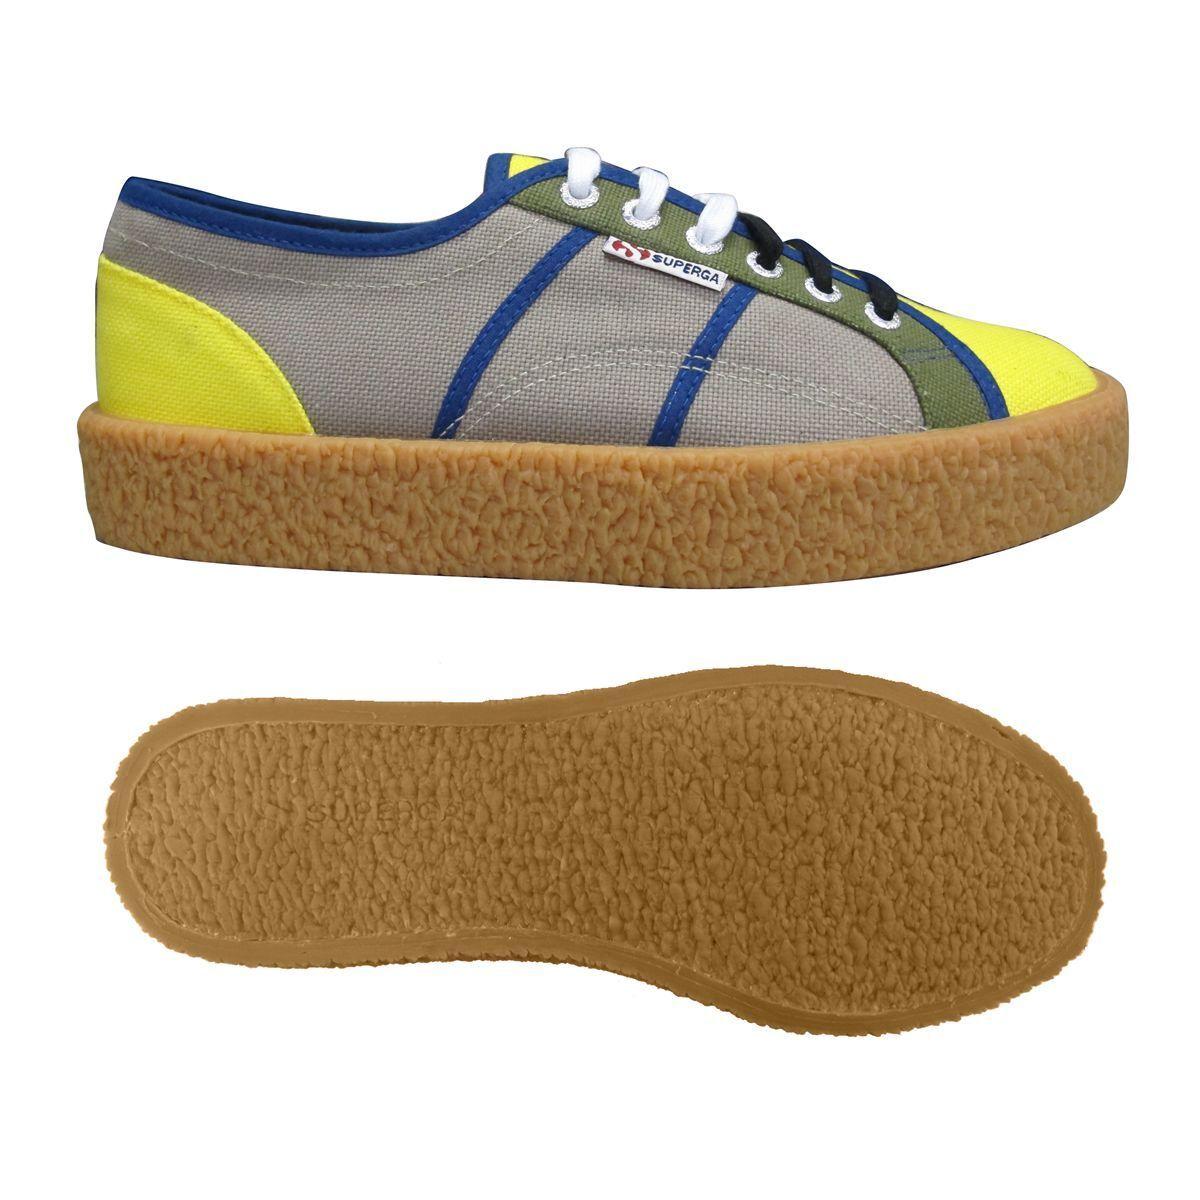 Superga Zapatos hombre Sneakers 2750-COTU MULTICOLOR MEGA hombre Zapatos mujer Citta PUR Basso c4e87b